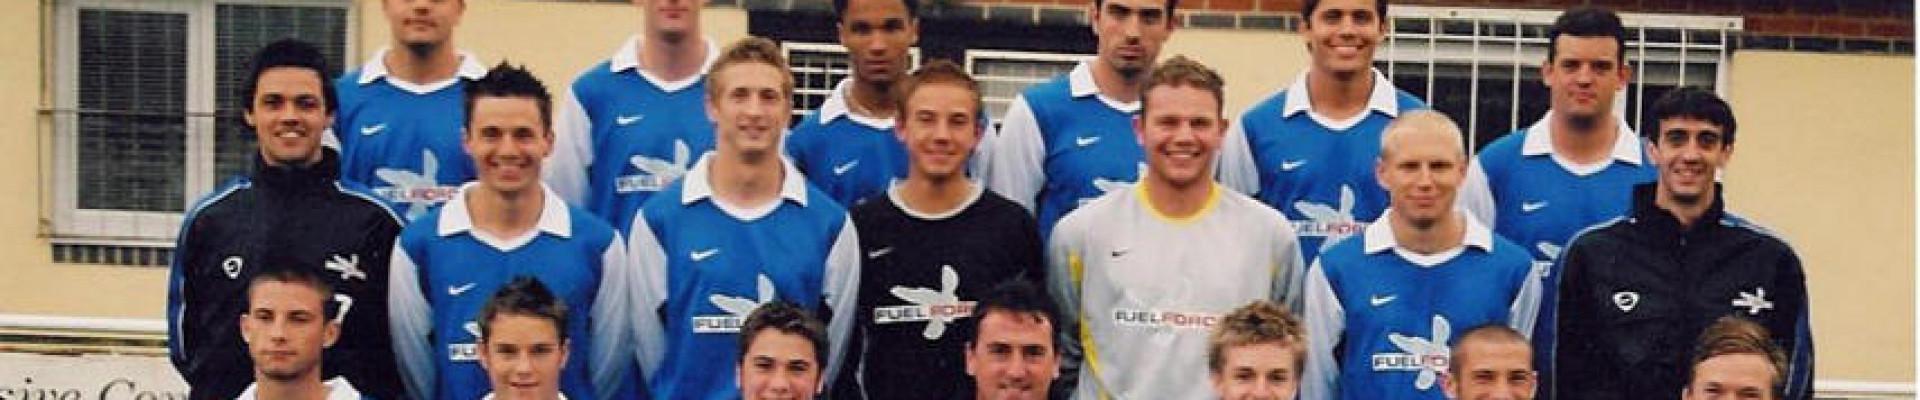 Team Photo 2003/04 Season